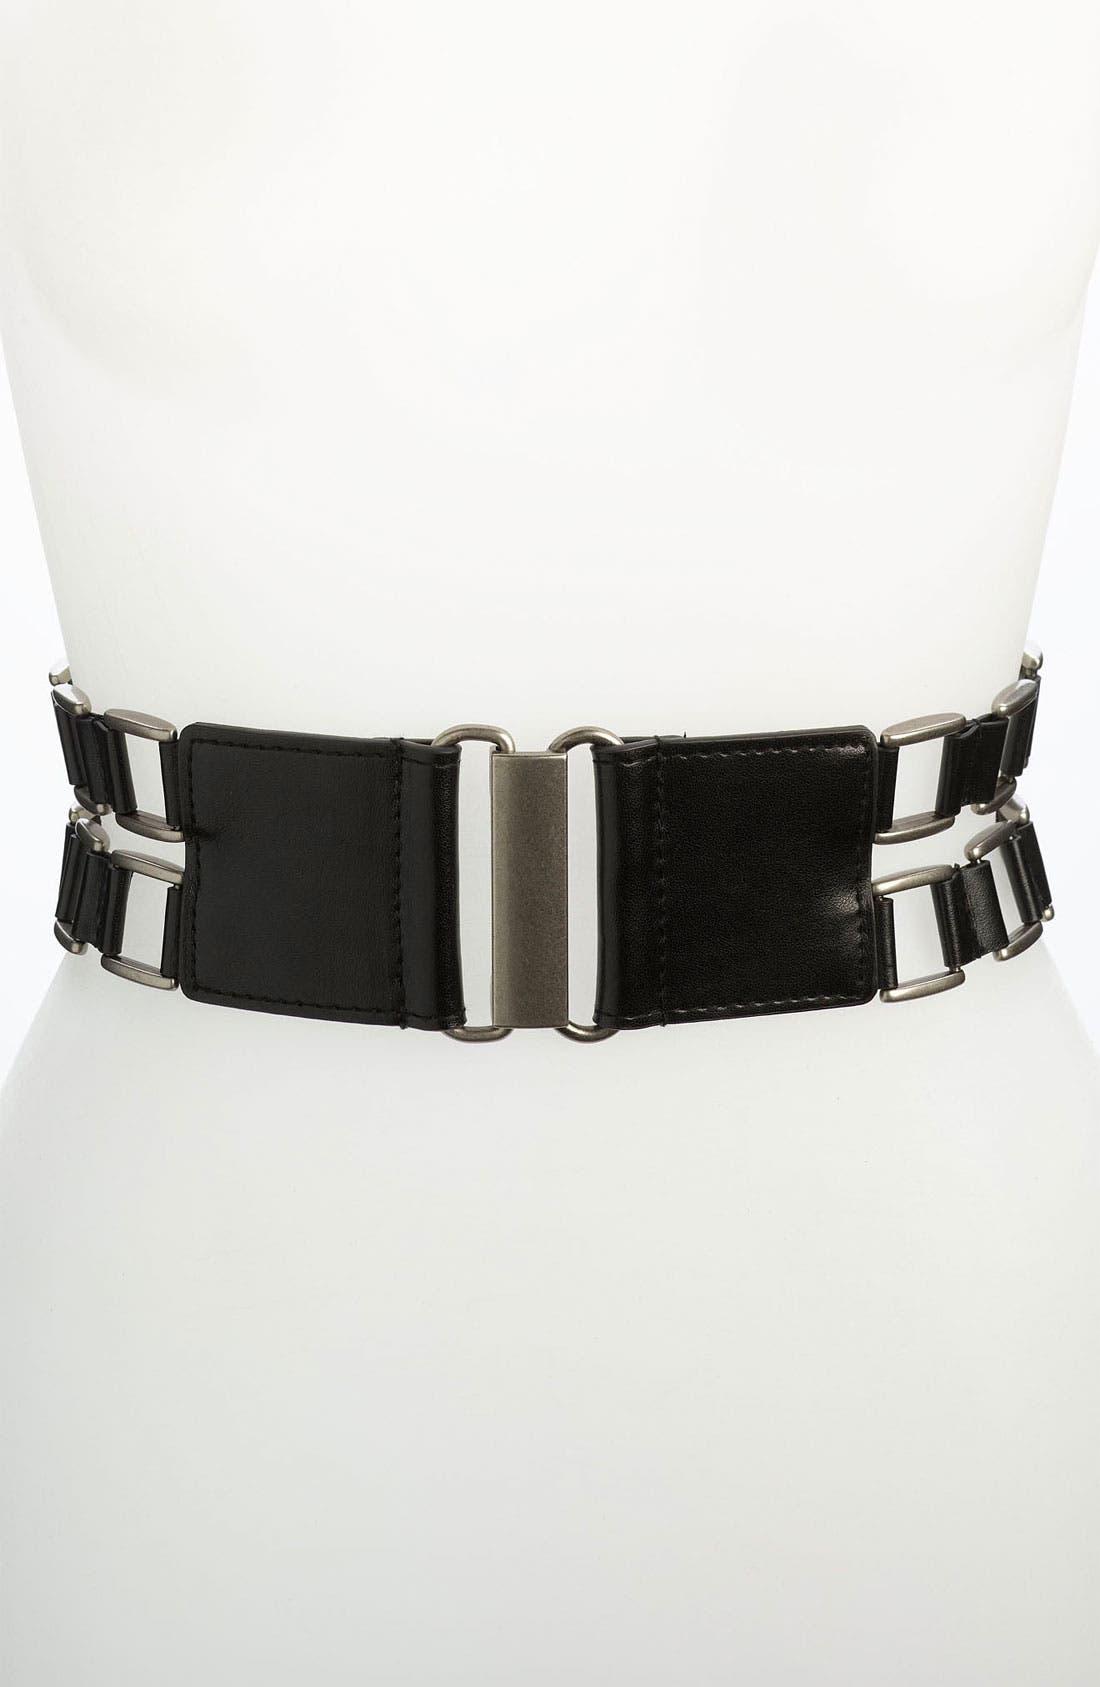 Main Image - Belgo Lux Stretch Belt